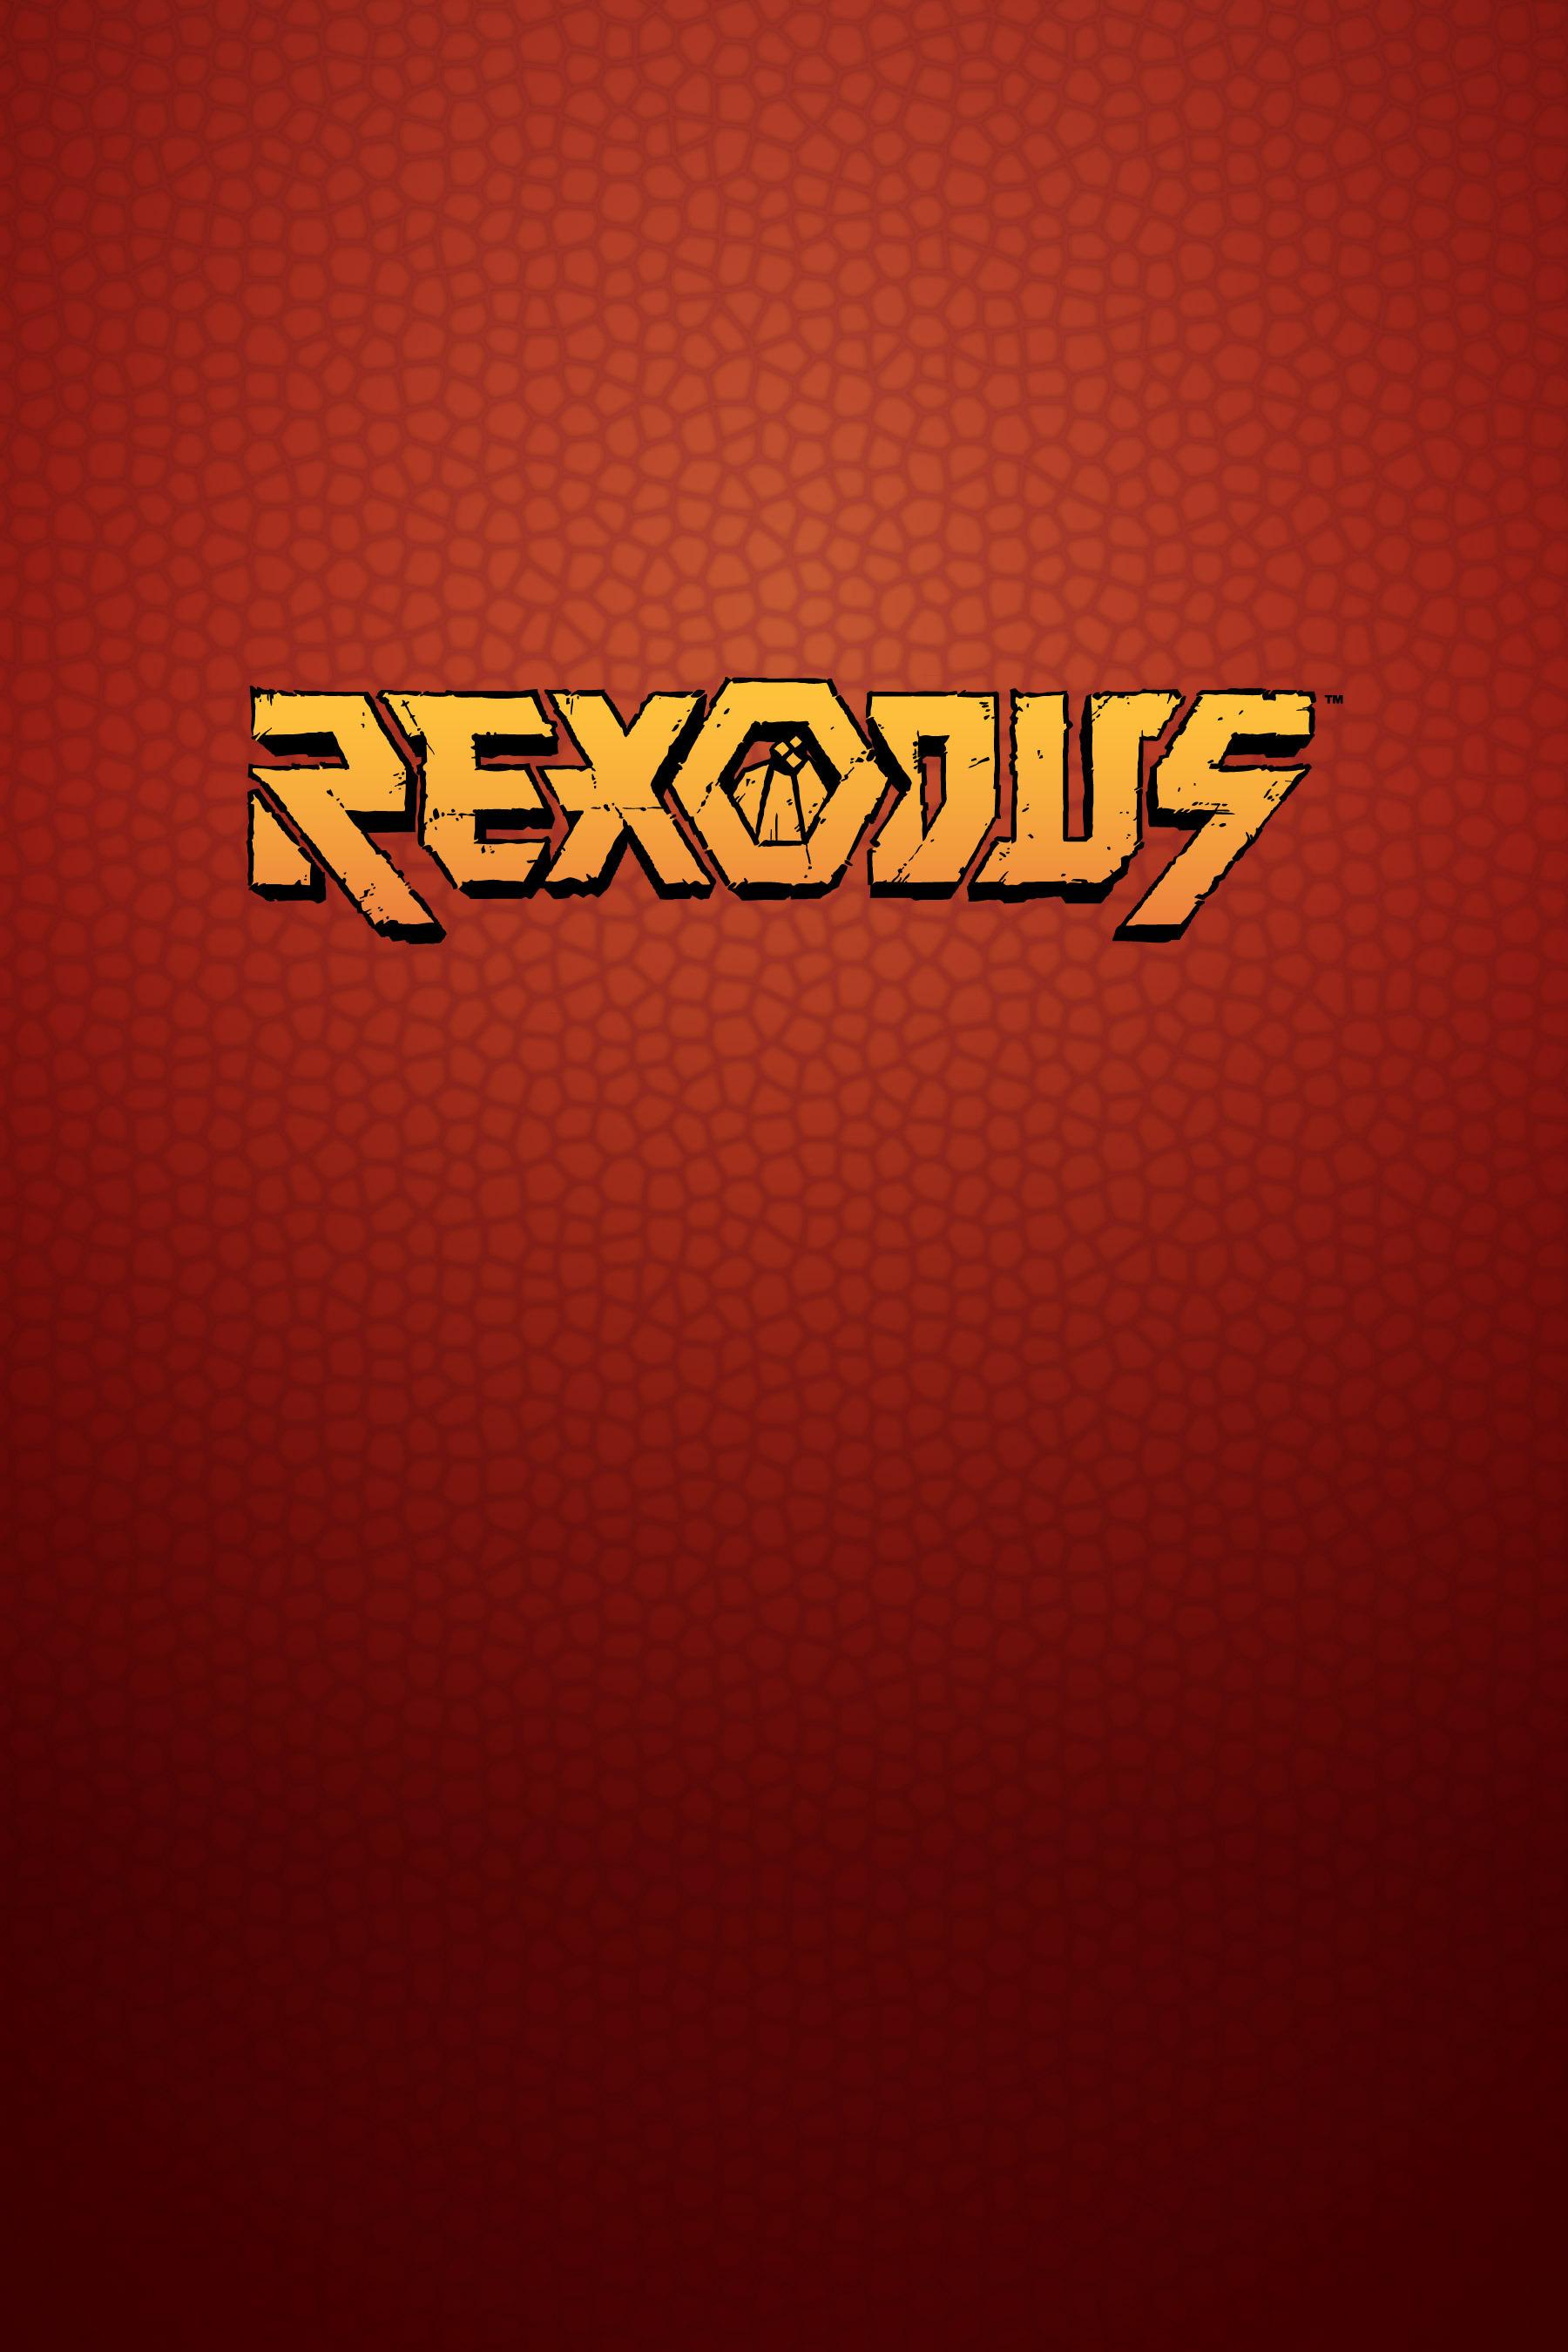 Read online Rexodus comic -  Issue # Full - 3